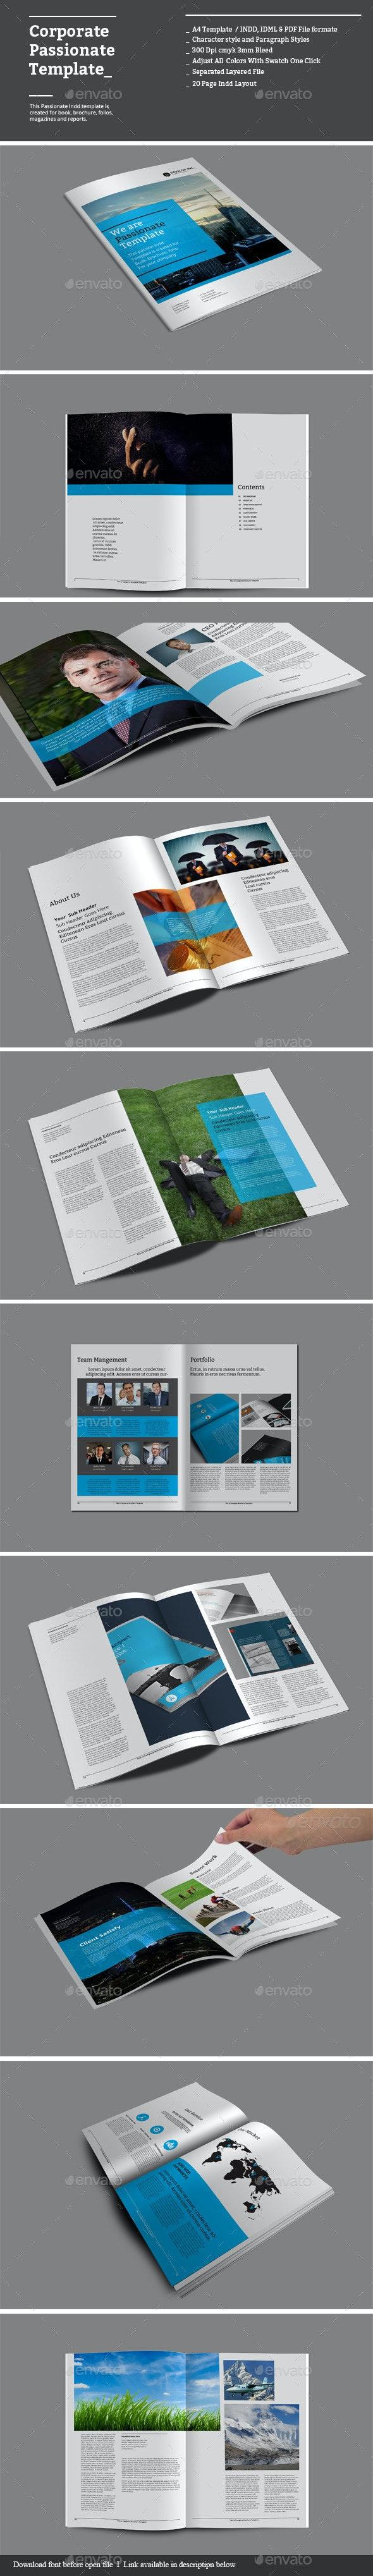 Corporate Passionate Templates - Corporate Brochures